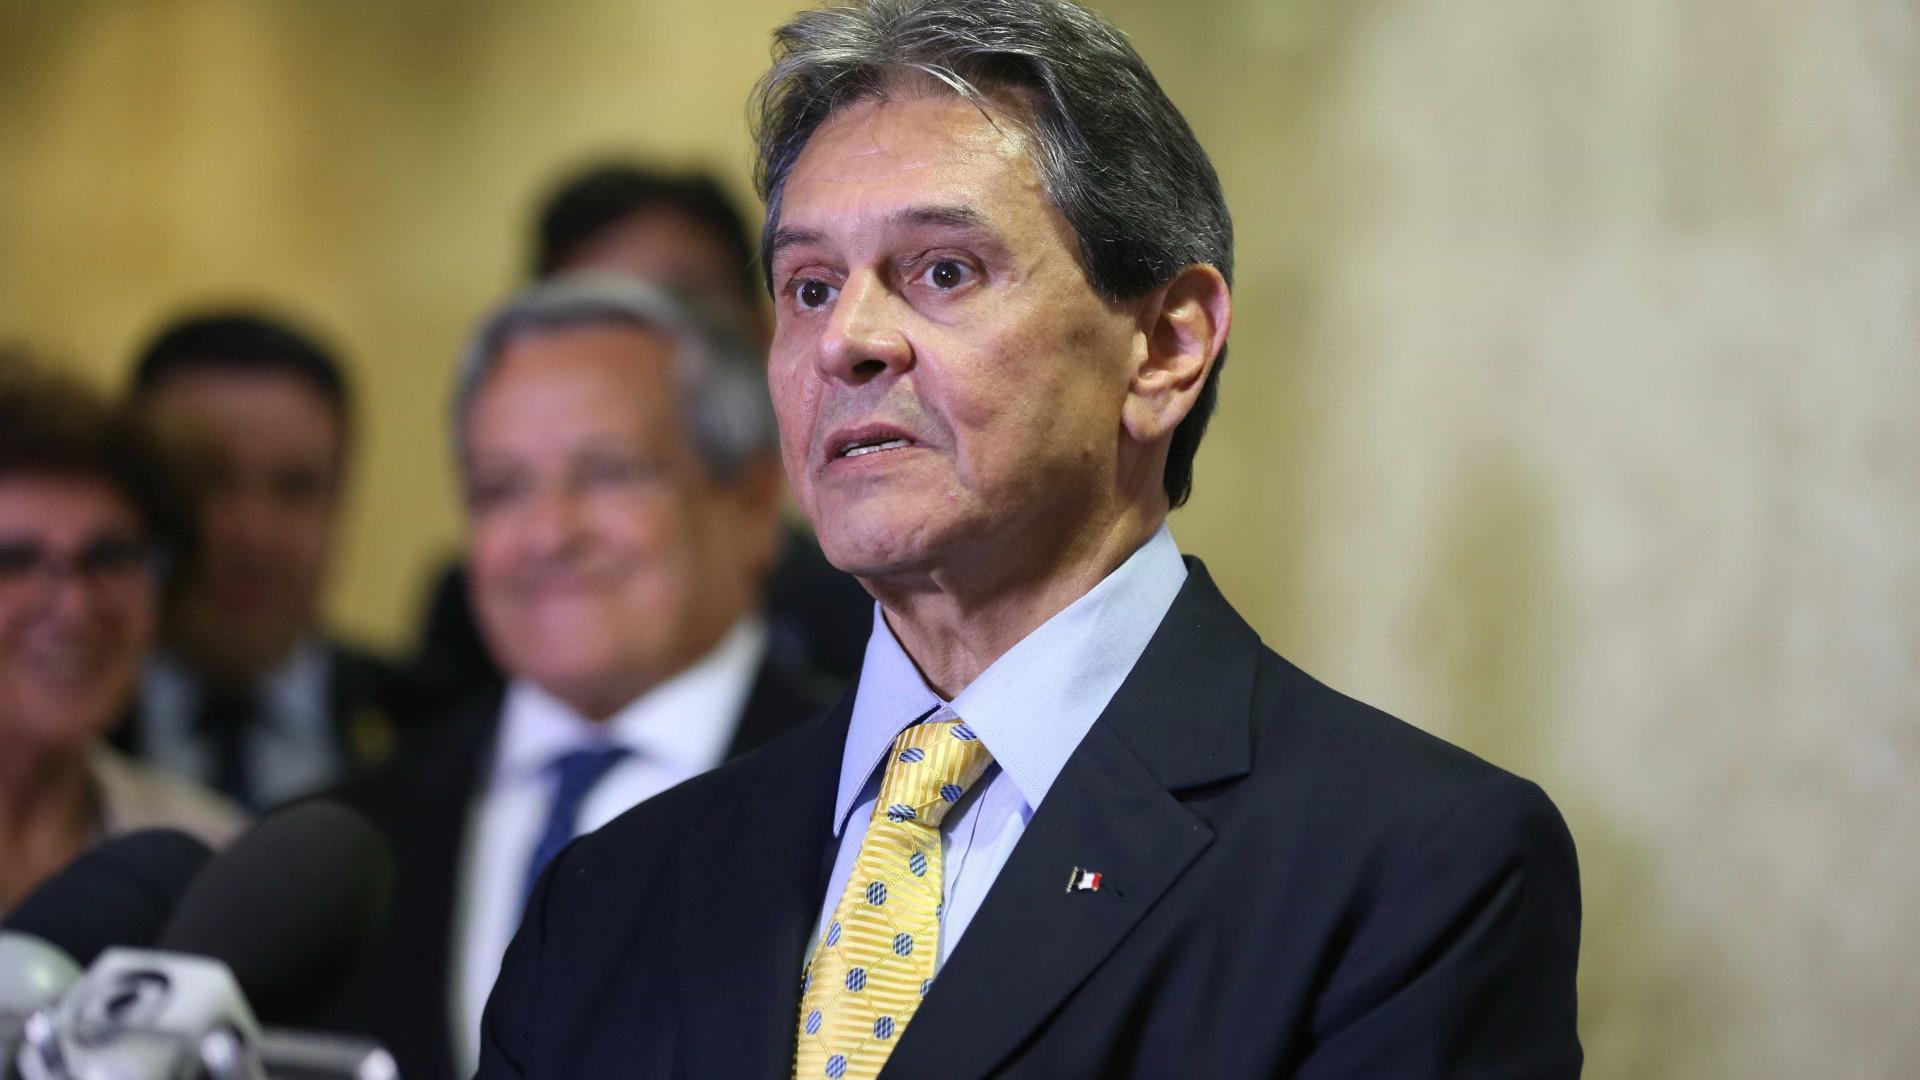 PTB, de Roberto Jefferson, anuncia apoio a Bolsonaro no 2º turno